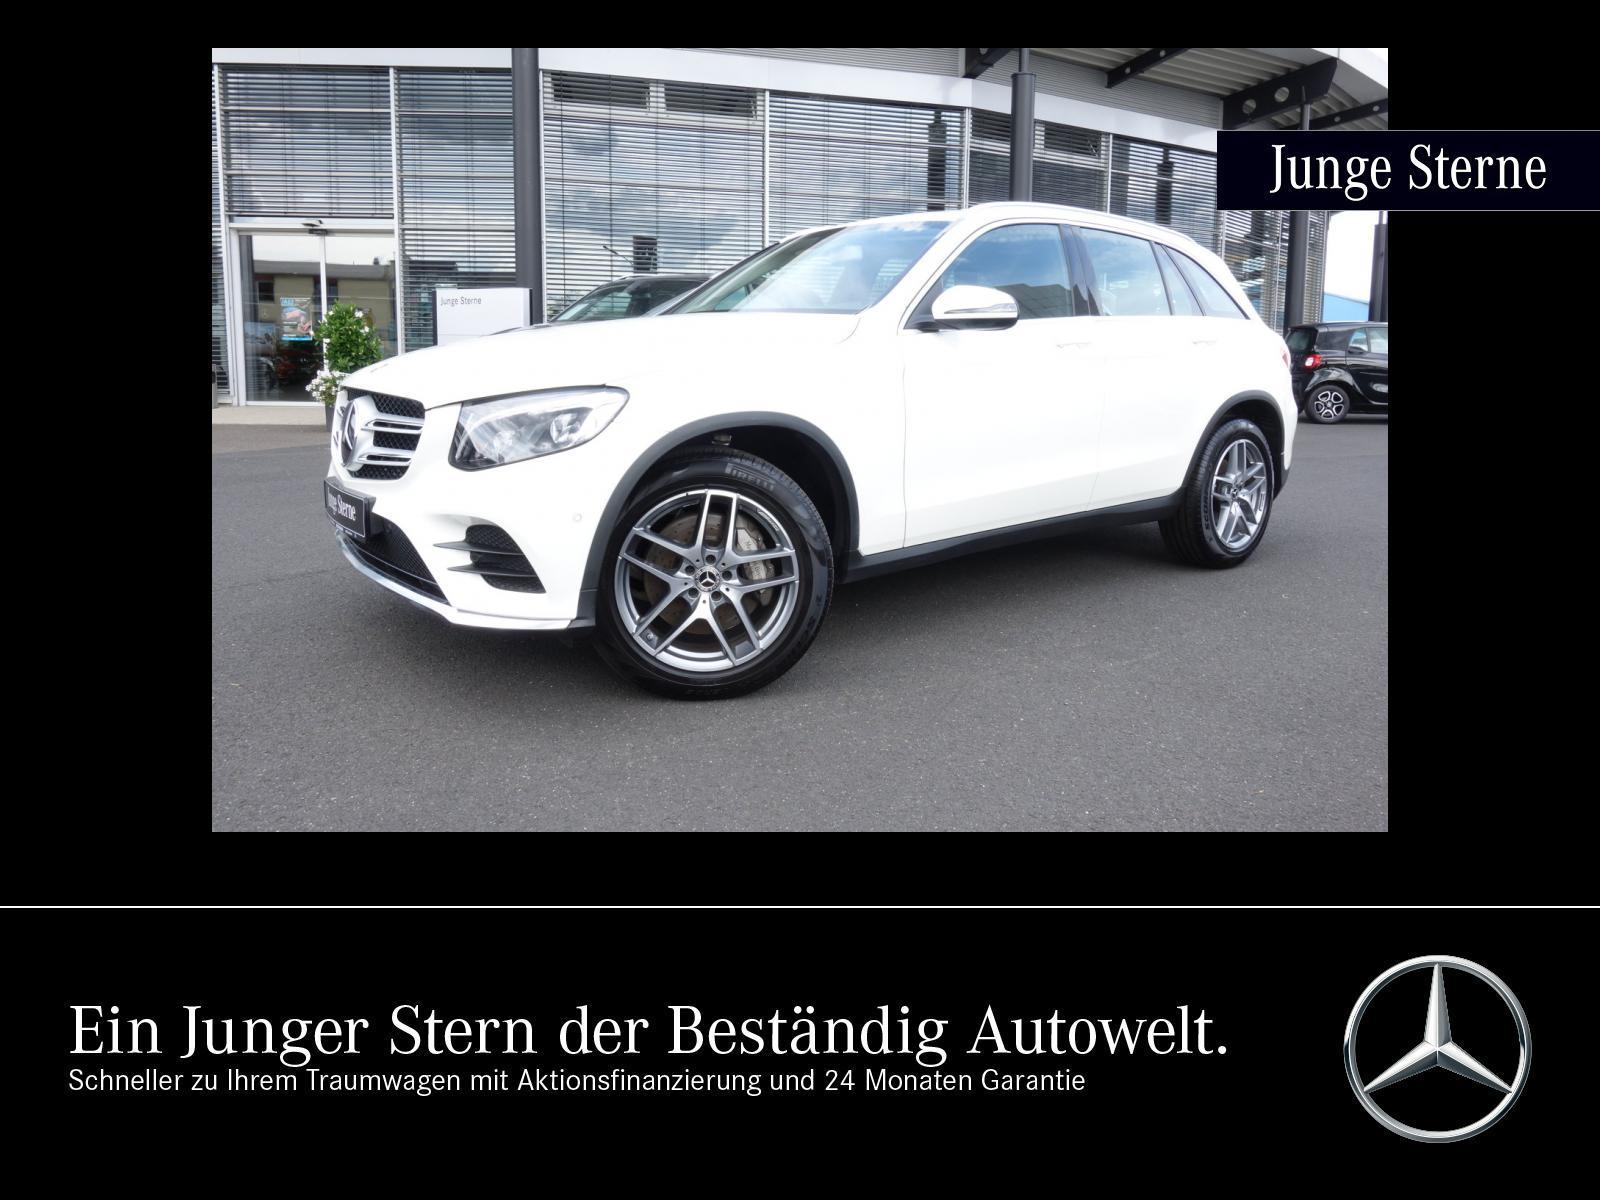 Mercedes-Benz GLC 250d 4M AMG#LED#DIST#AHK#Kamera#Navi#KEYLESS, Jahr 2017, Diesel